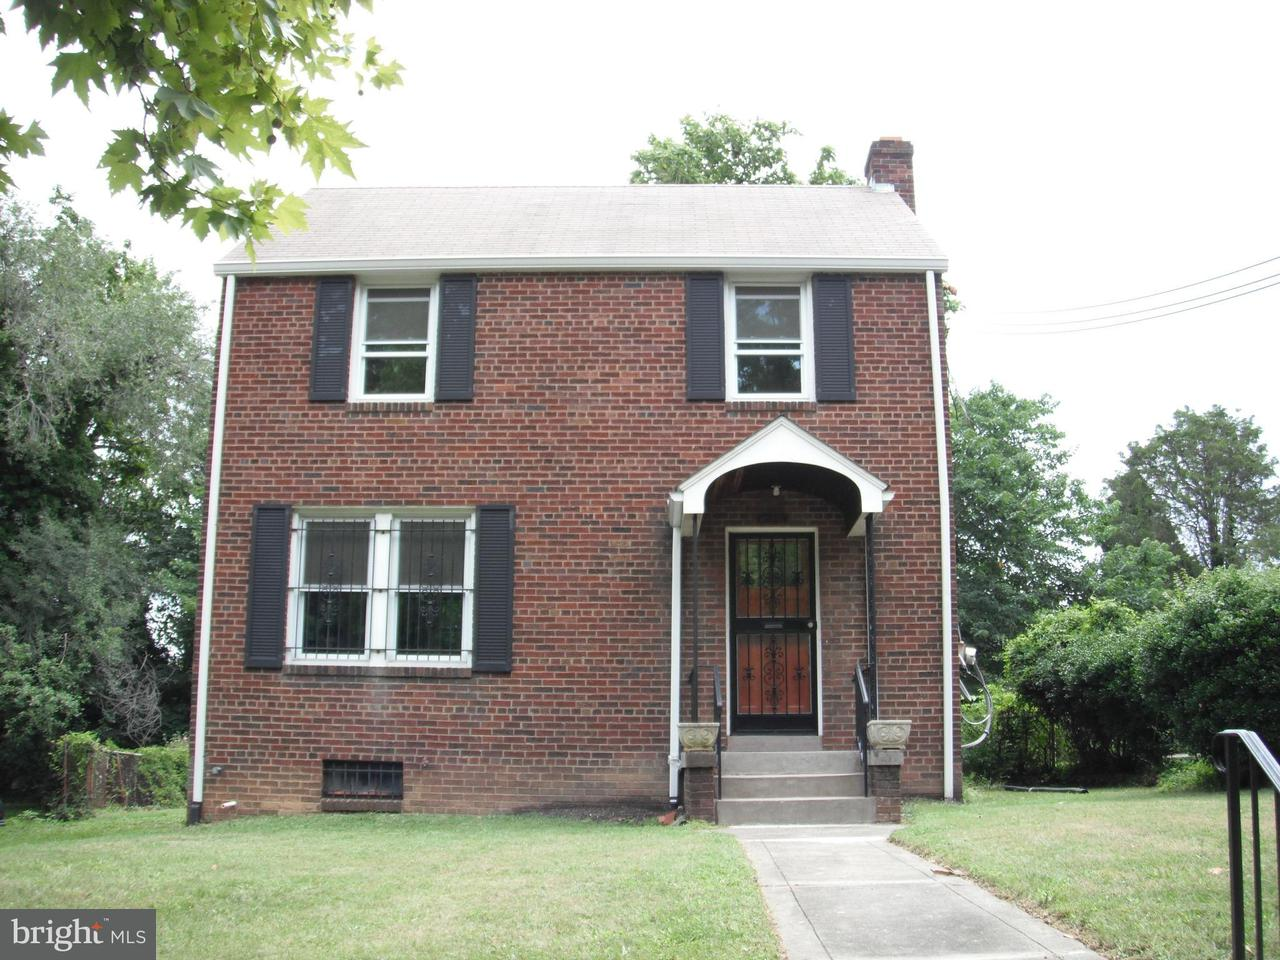 Single Family Home for Sale at 614 RIDGE RD SE 614 RIDGE RD SE Washington, District Of Columbia 20019 United States